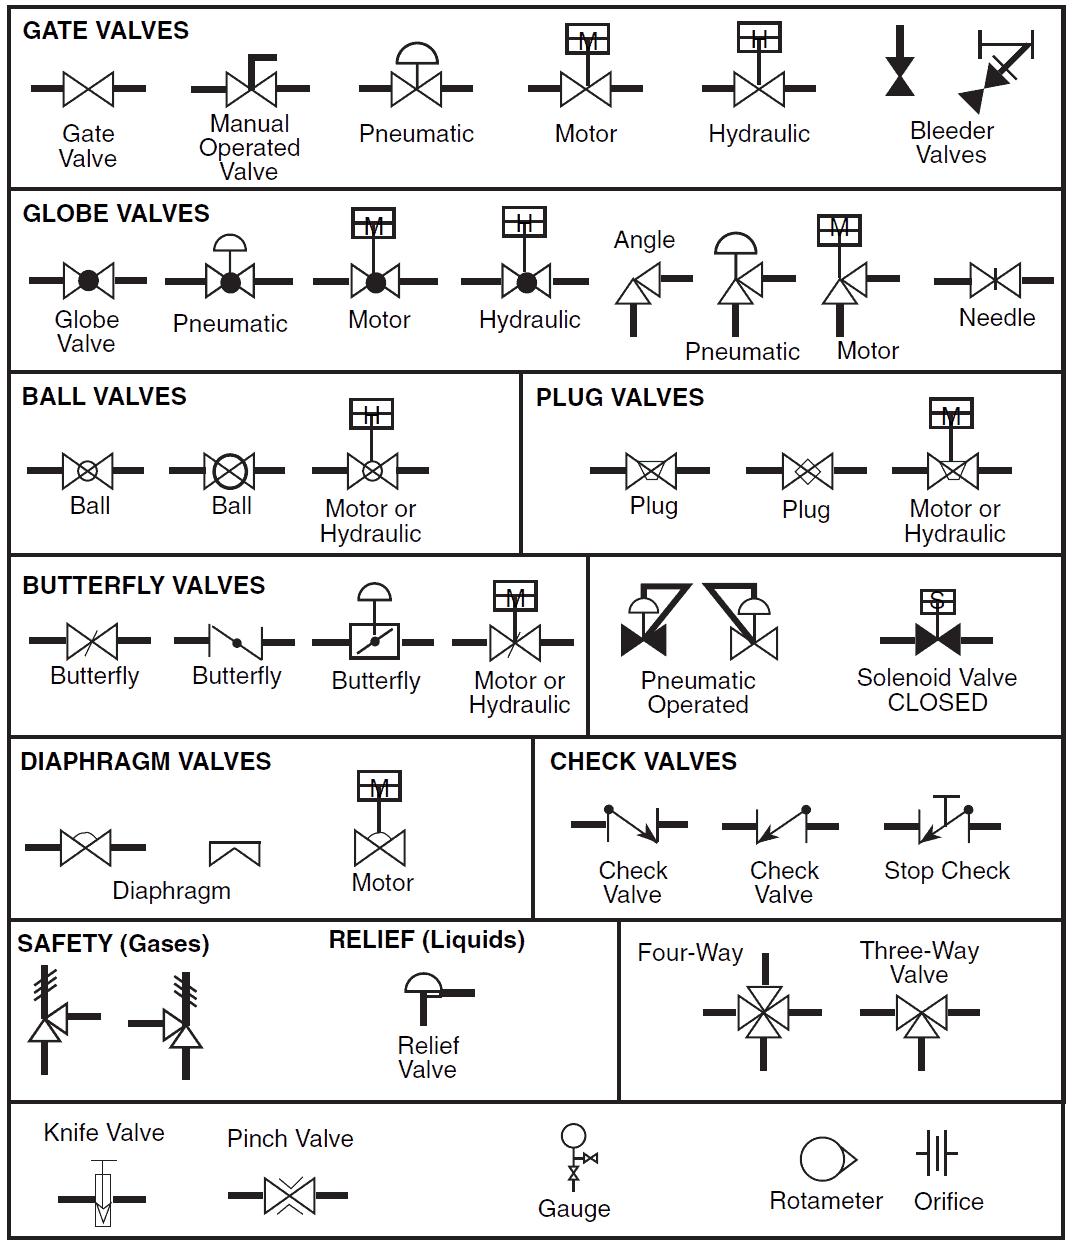 Valve P Id Symbols Mechanical Engineering Design Piping And Instrumentation Diagram Process Engineering